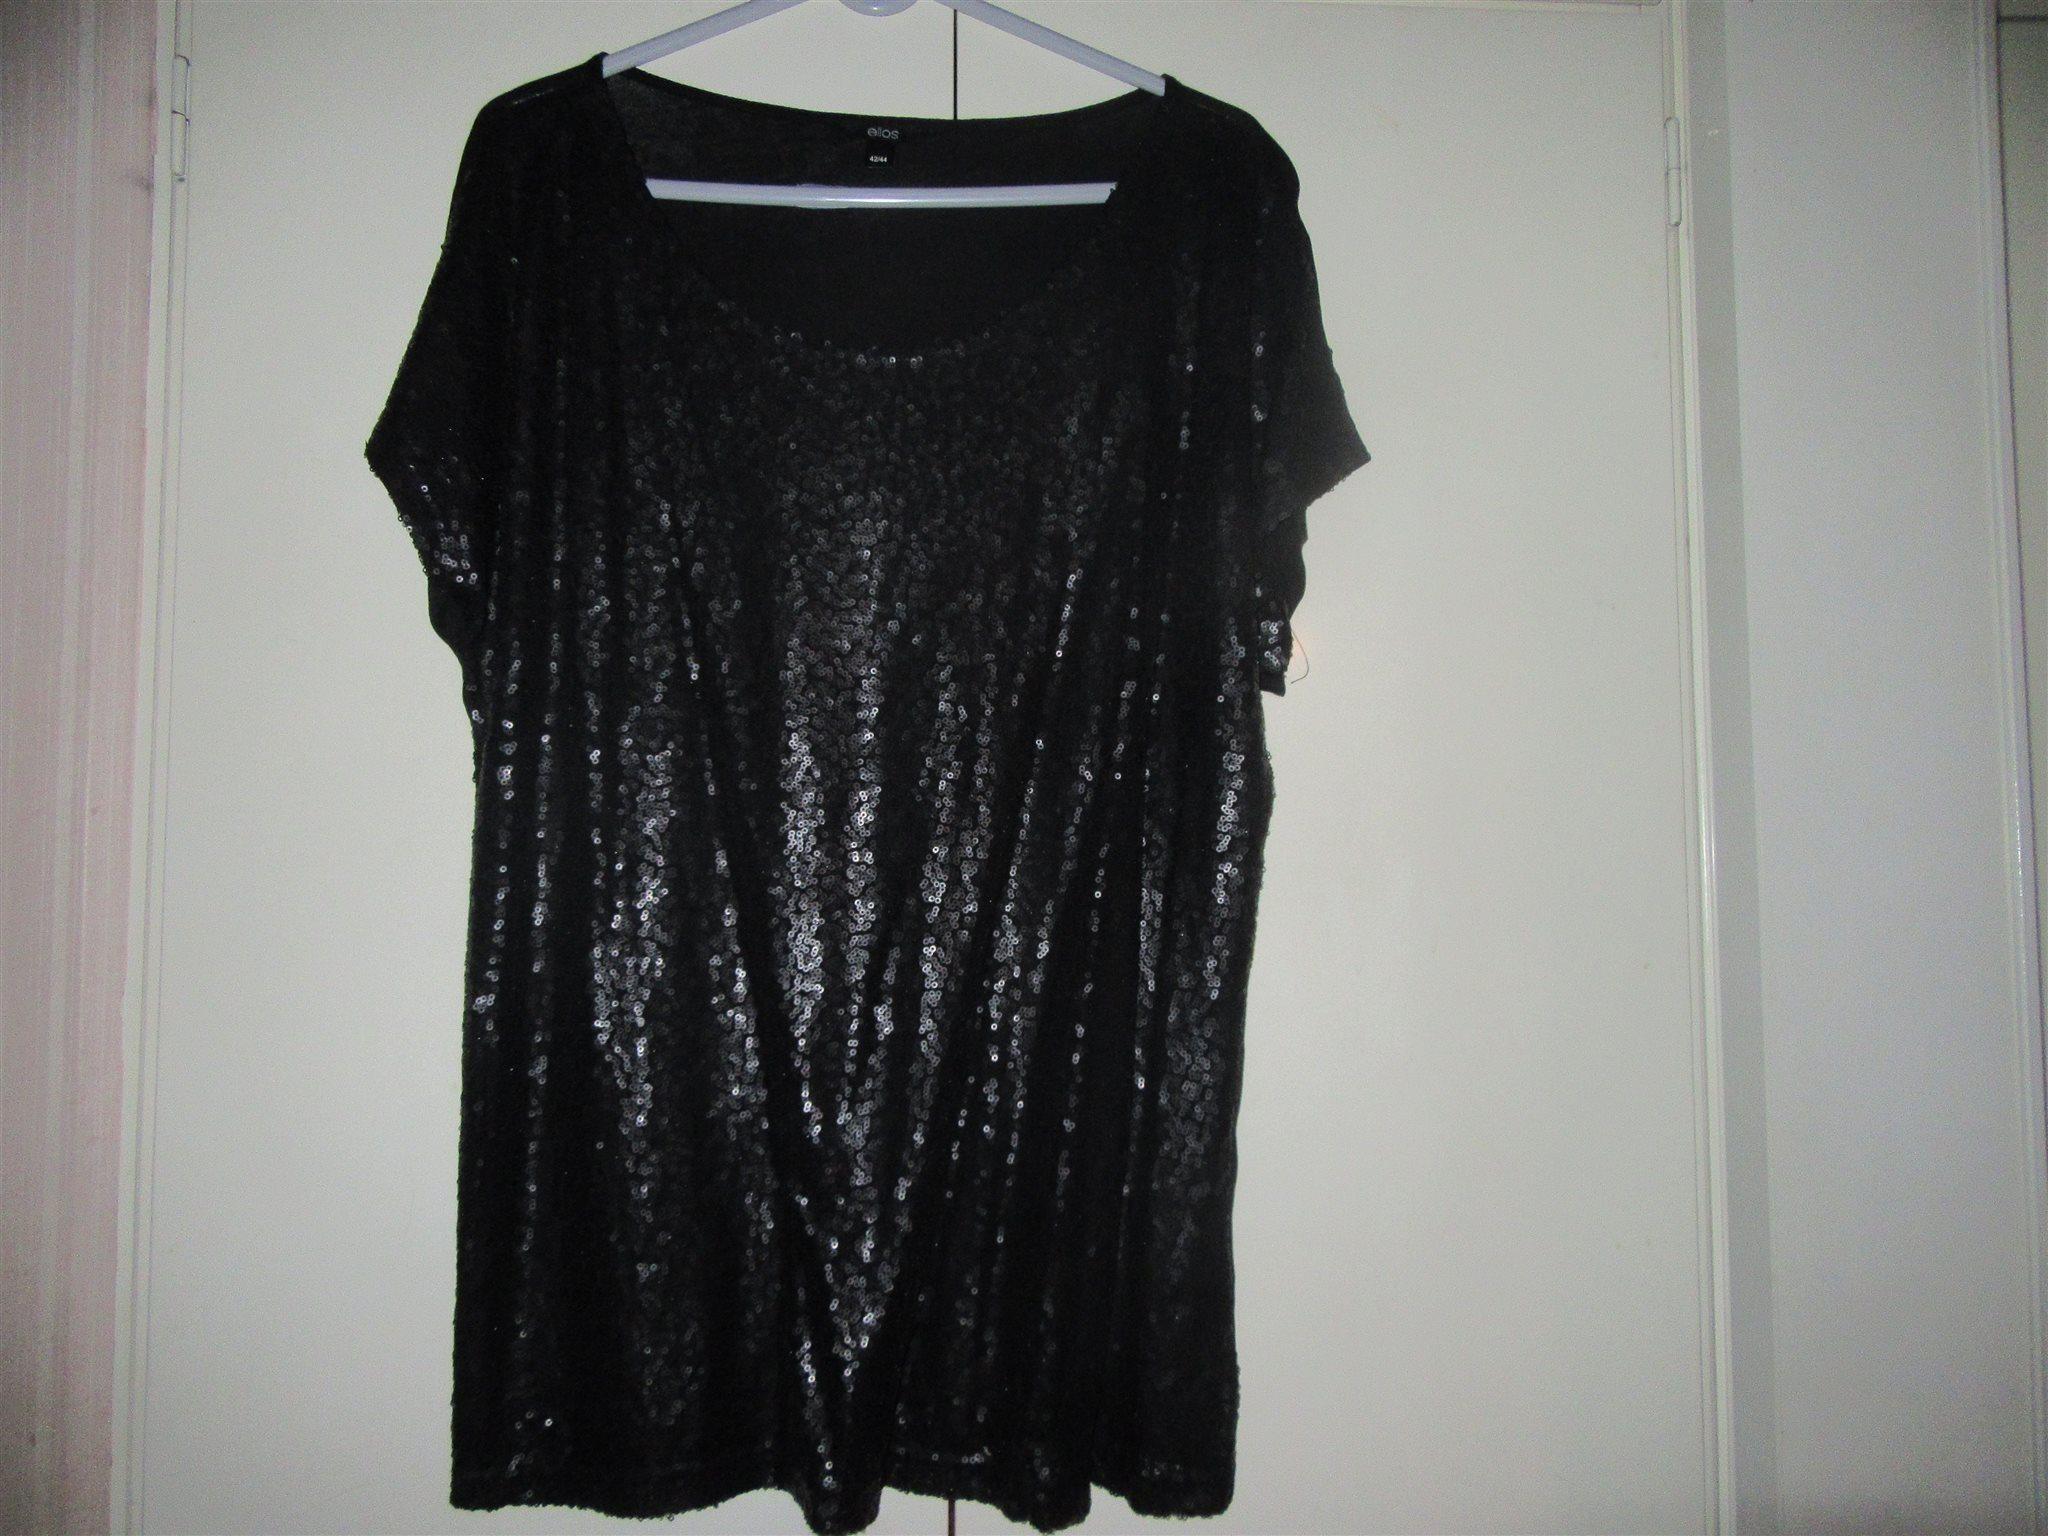 svart glittrig topp